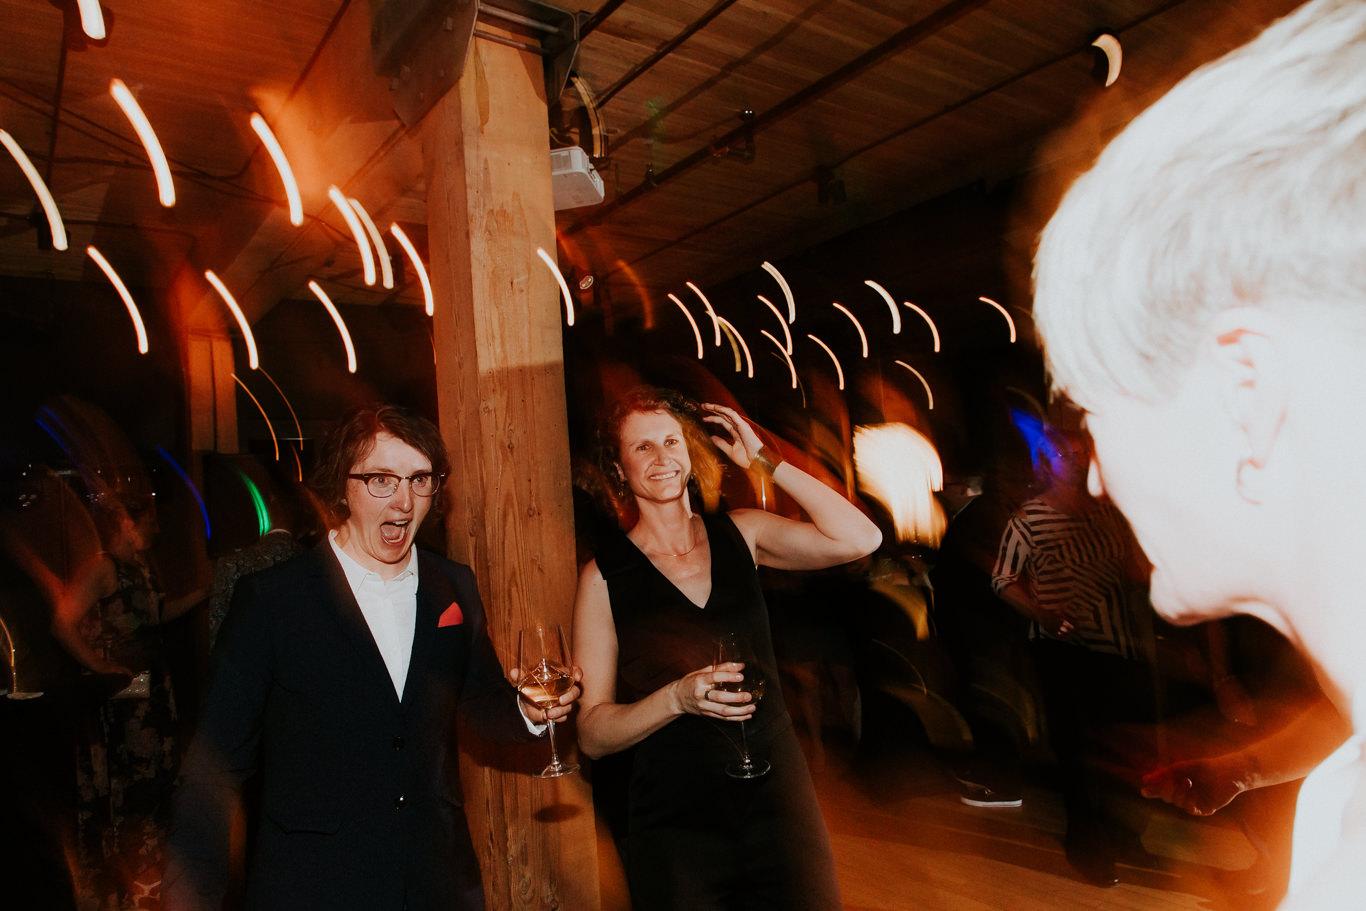 Lindsay-and-Heather-Charbar-Restaurant-Wedding-in-Calgary-219